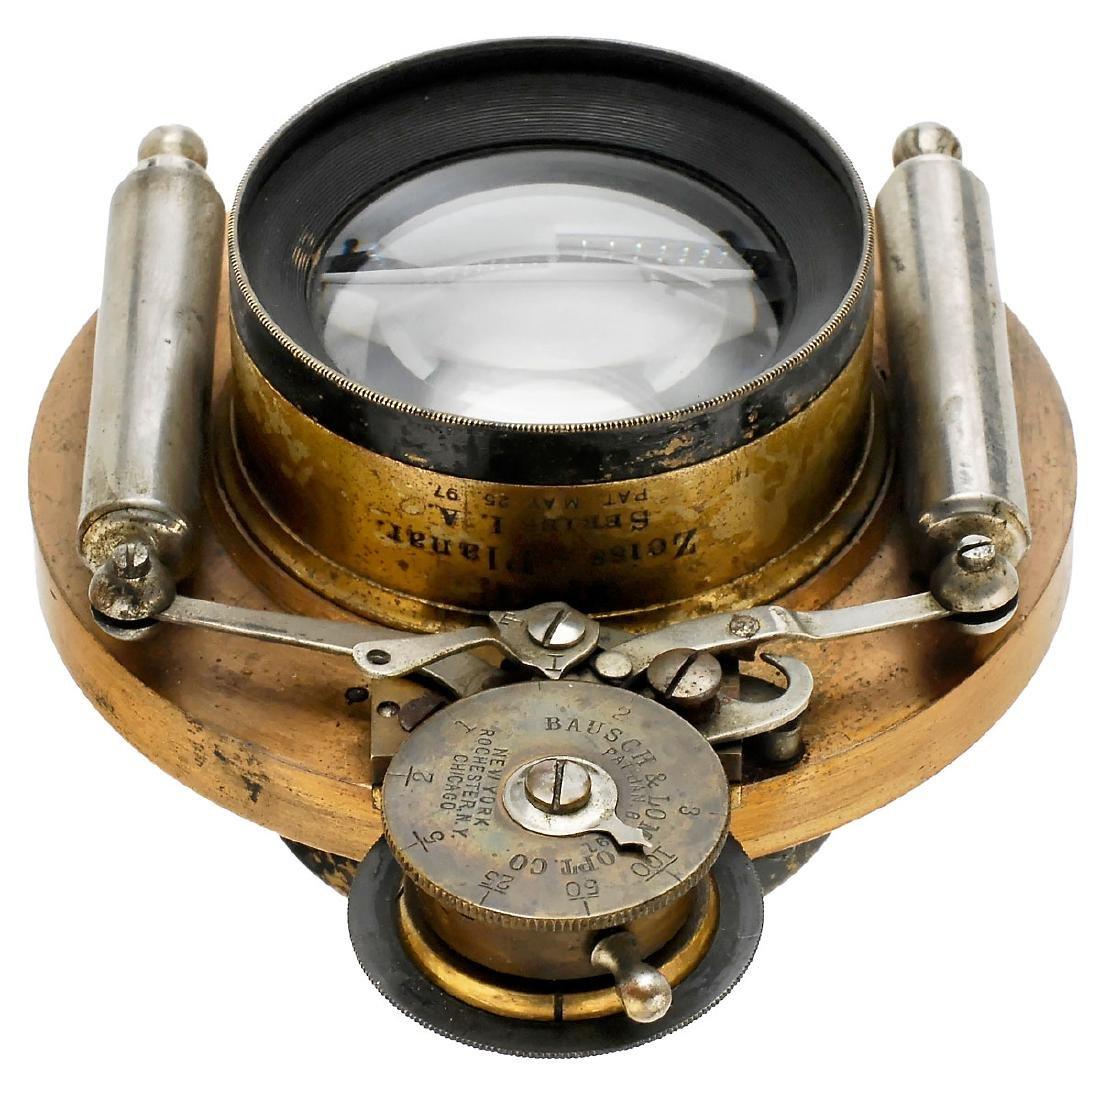 Bausch & Lomb Zeiss-Planar Series I.A., Patent 1897